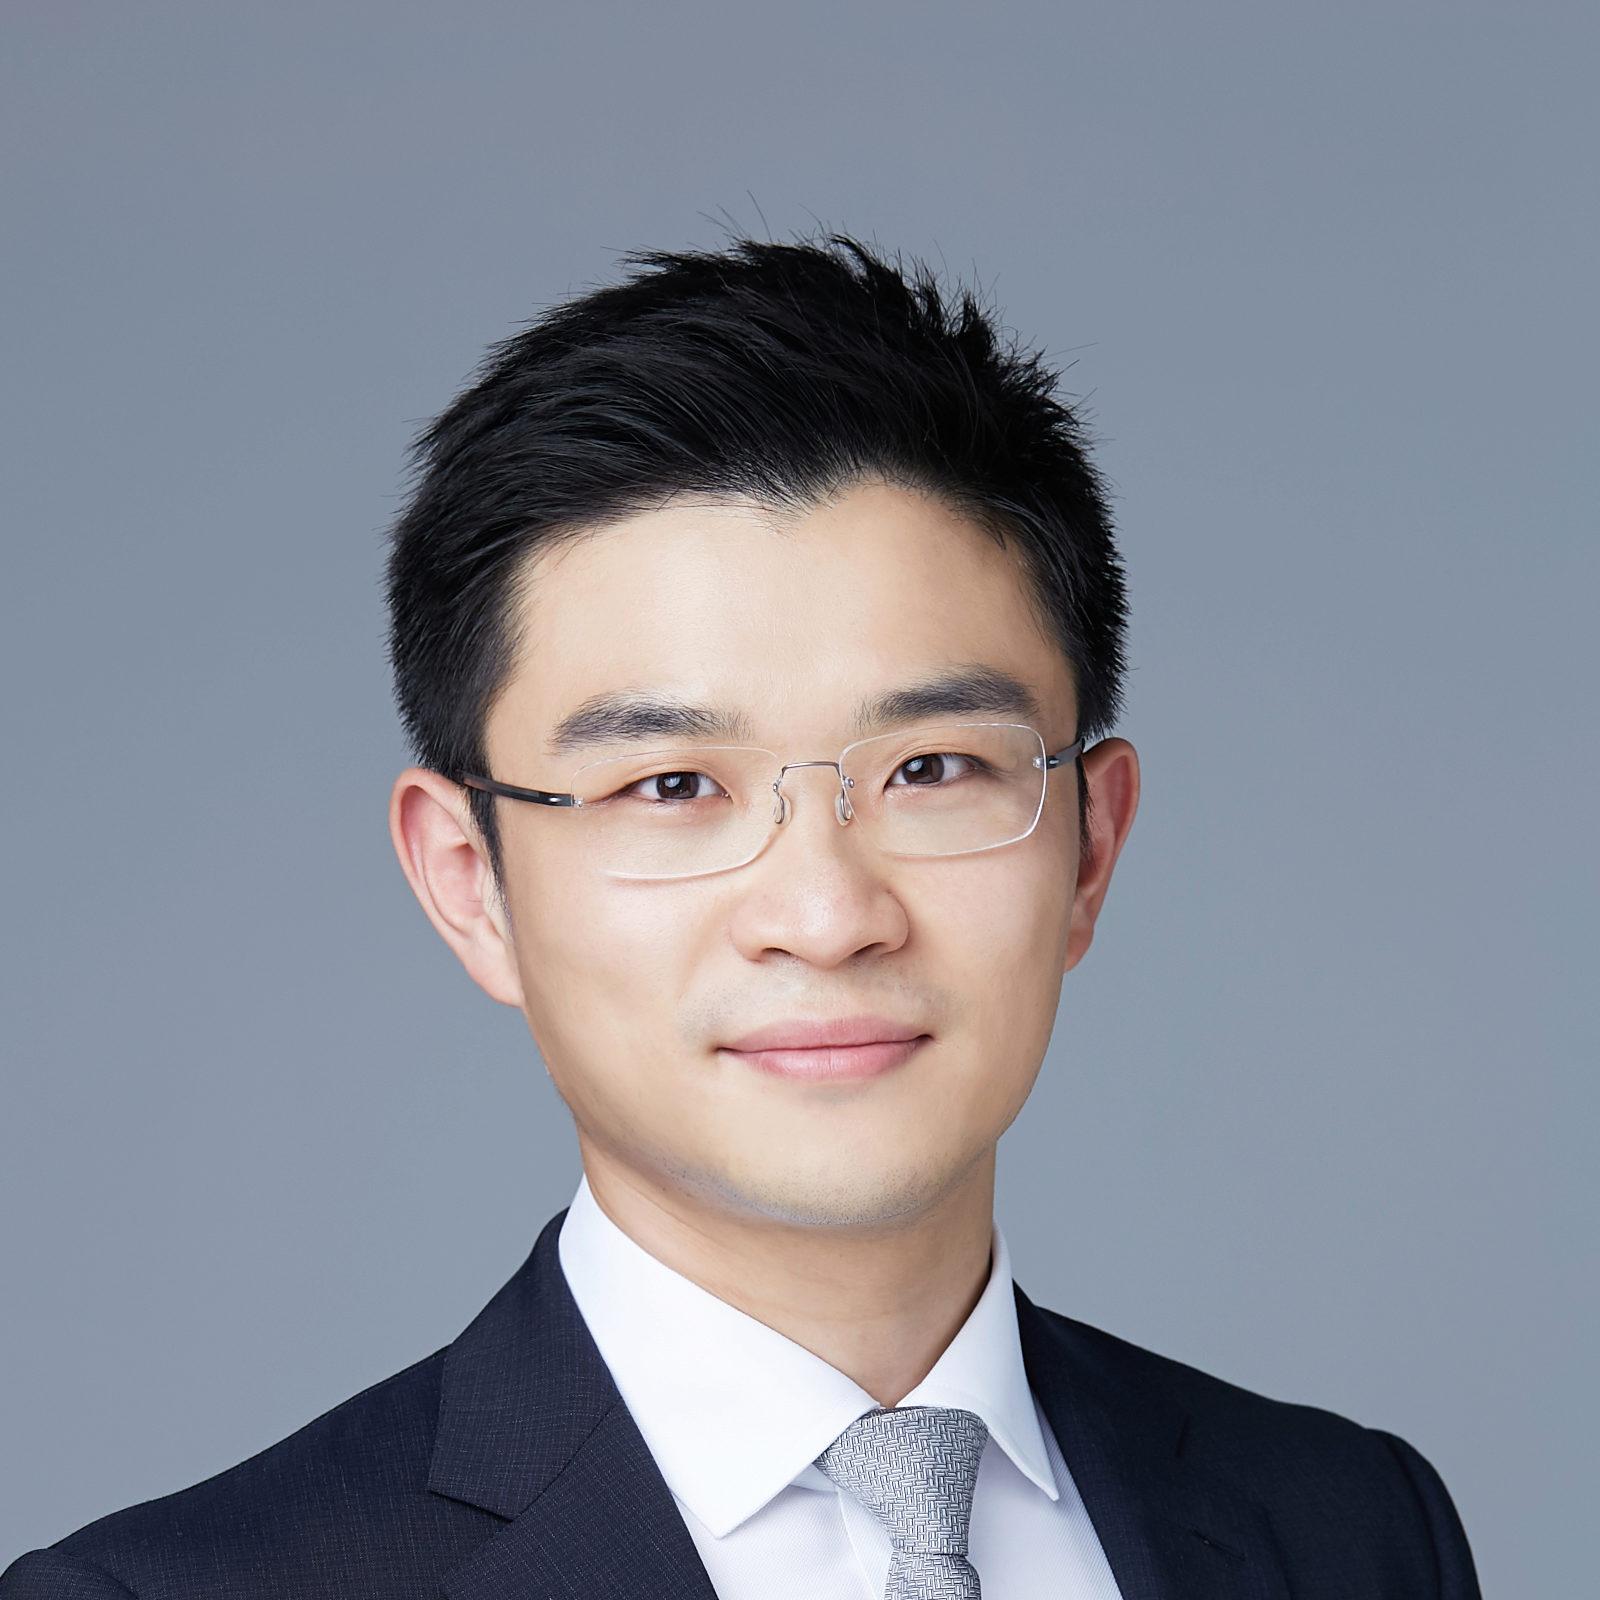 Yicheng Zhu